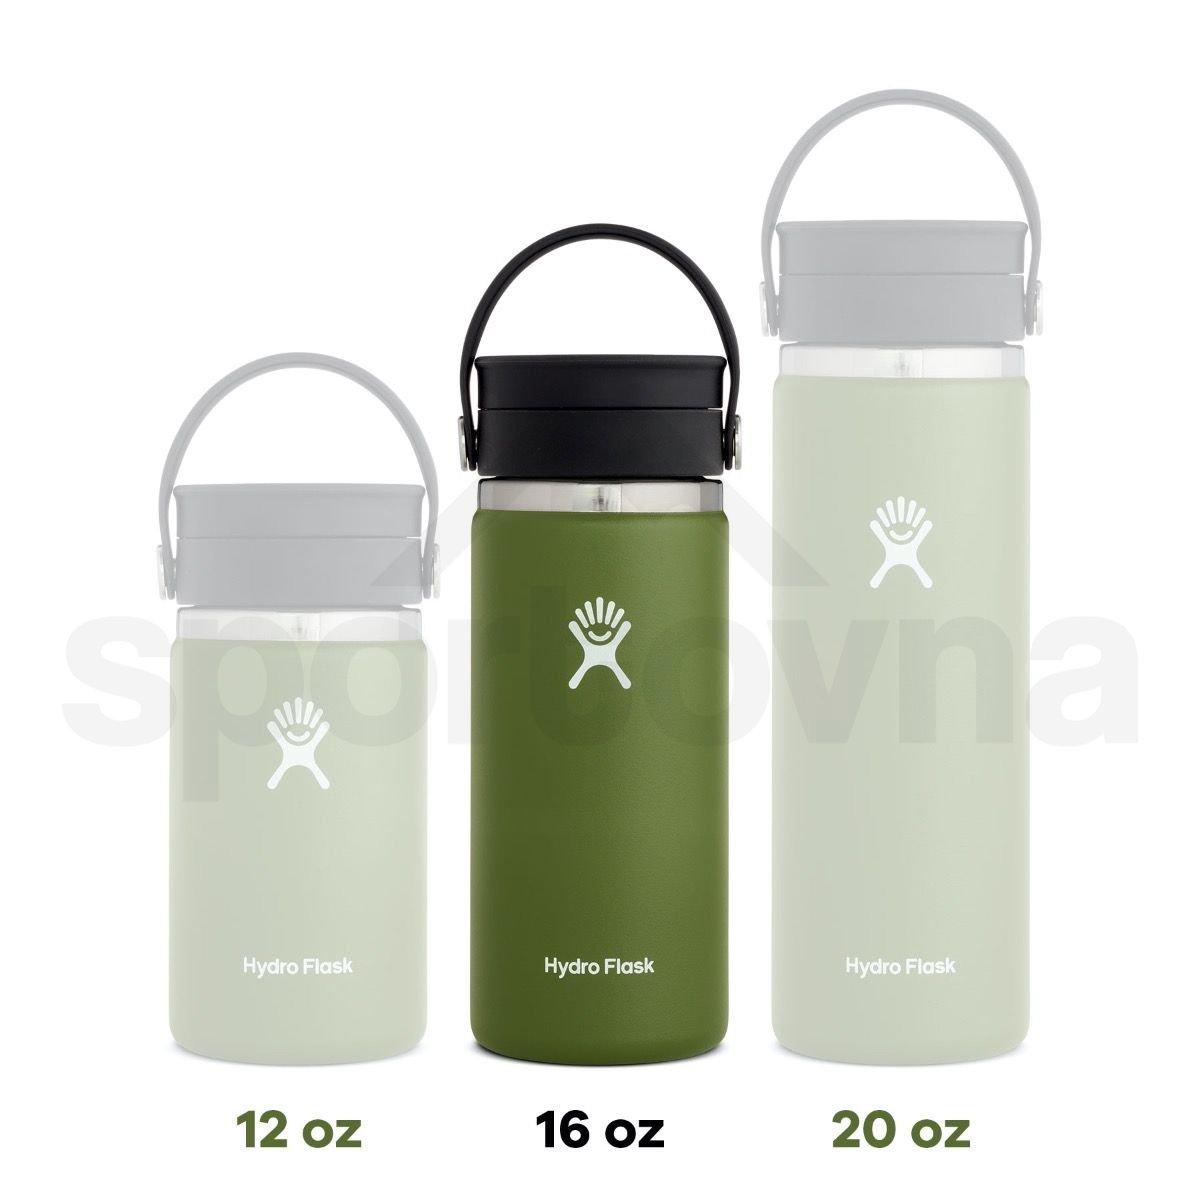 Termohrnek Hydro Flask Coffee Wide Mouth Flex Sip Lid 16 oz - oranžová